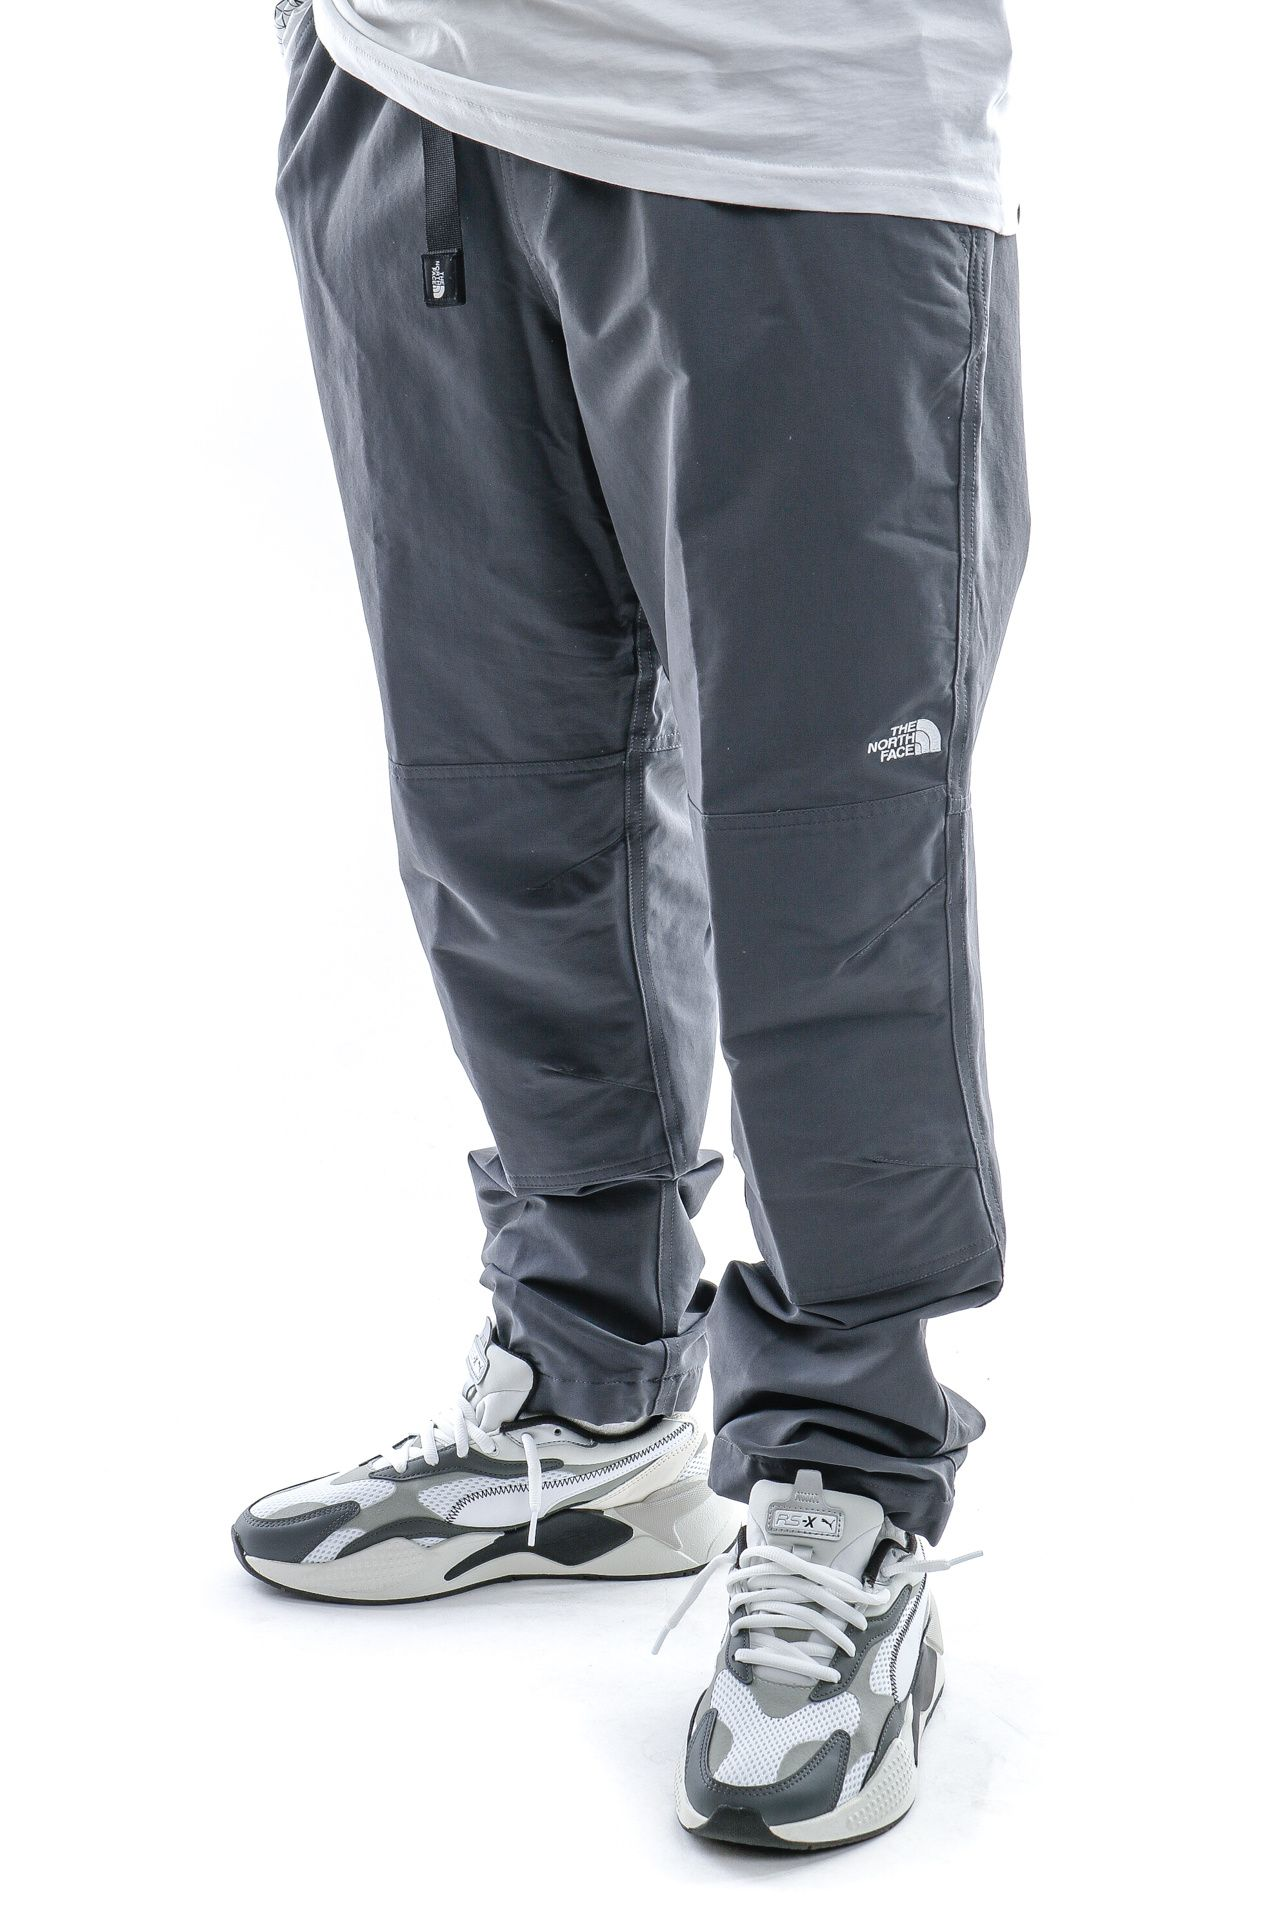 Afbeelding van The North Face Broek Men's Woven Pull On Pant Vanadis Grey NF0A4QPH1741